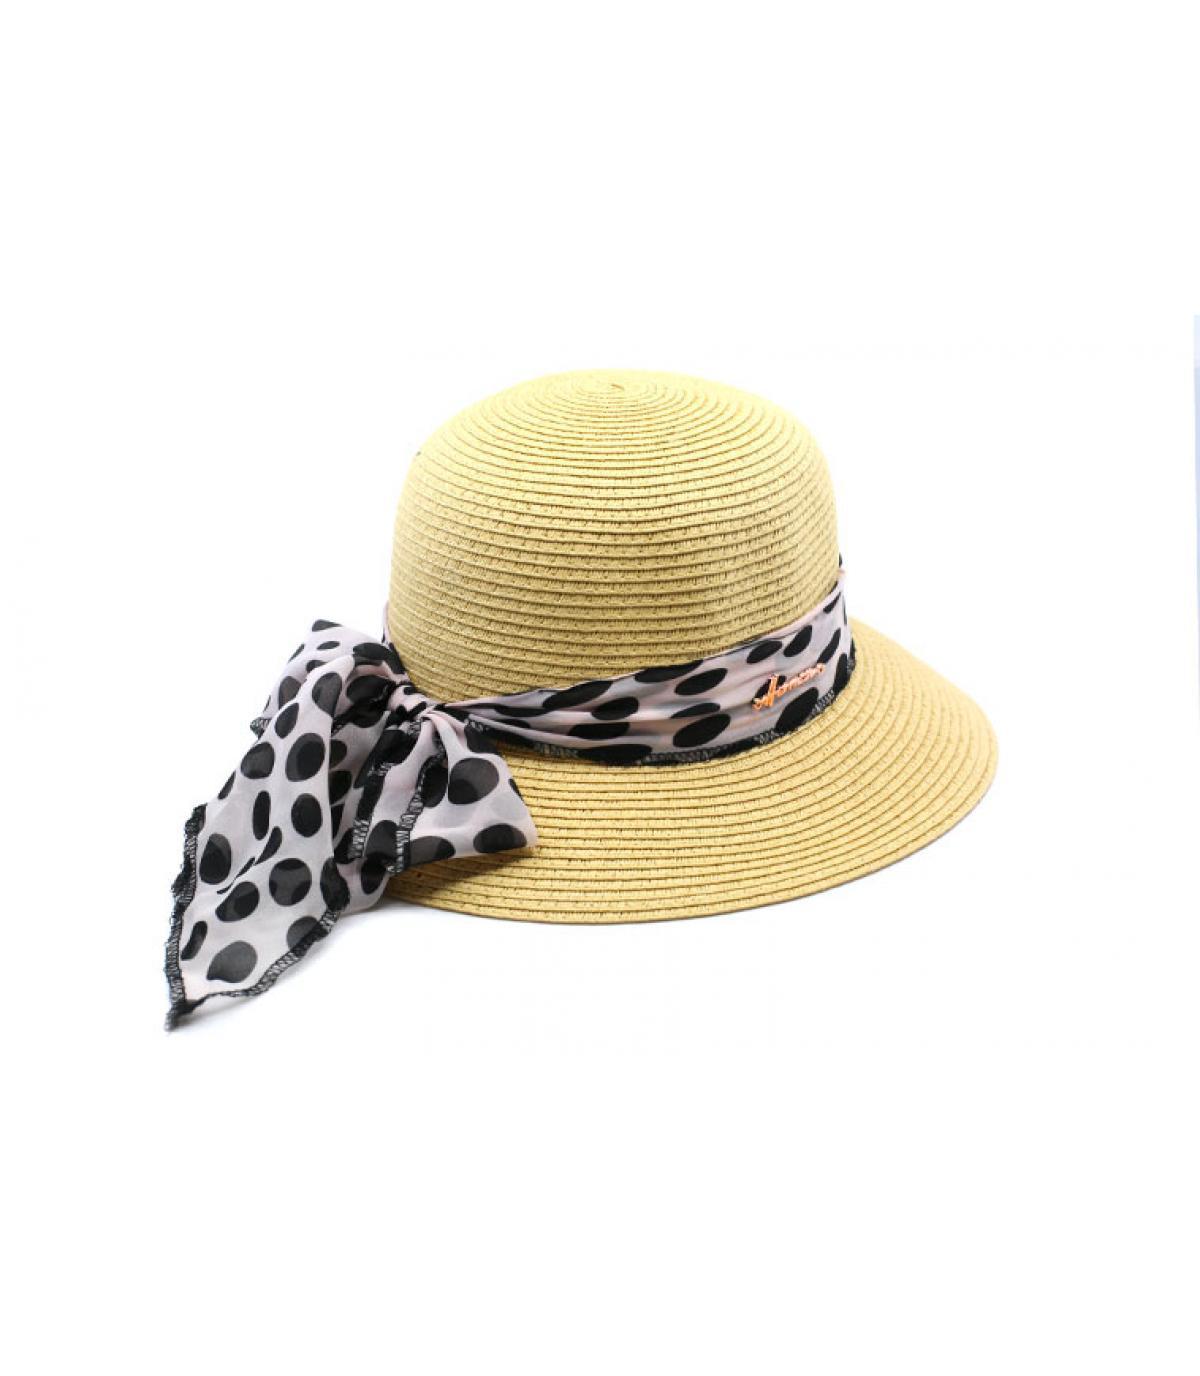 sombrero cloche paja pañuelo